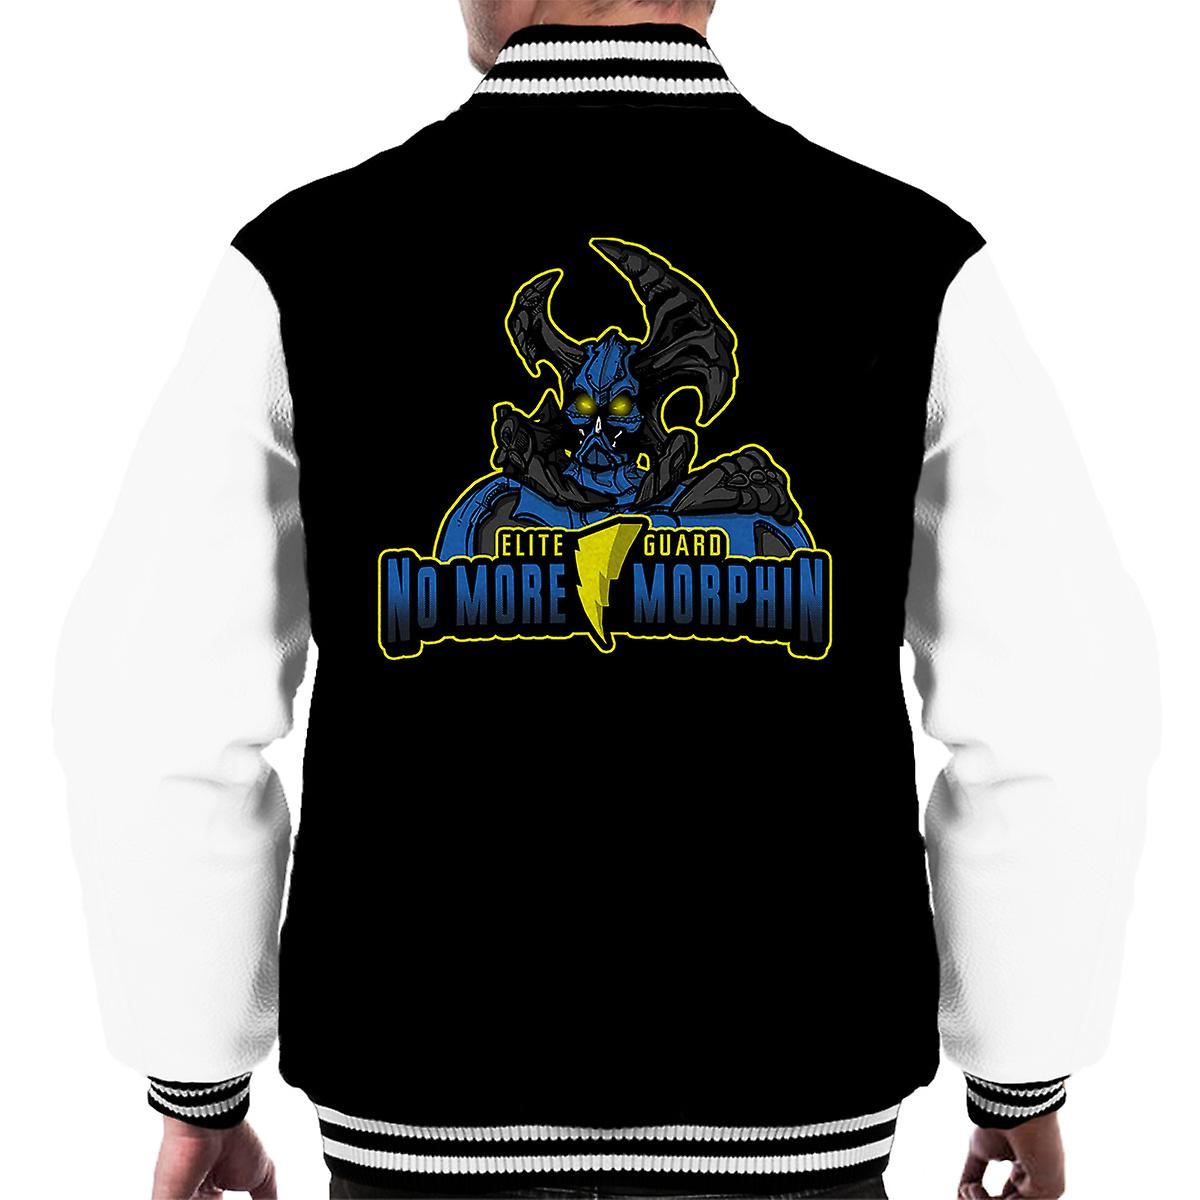 No More Morphin Matacore Power Rangers Men's Varsity Jacket